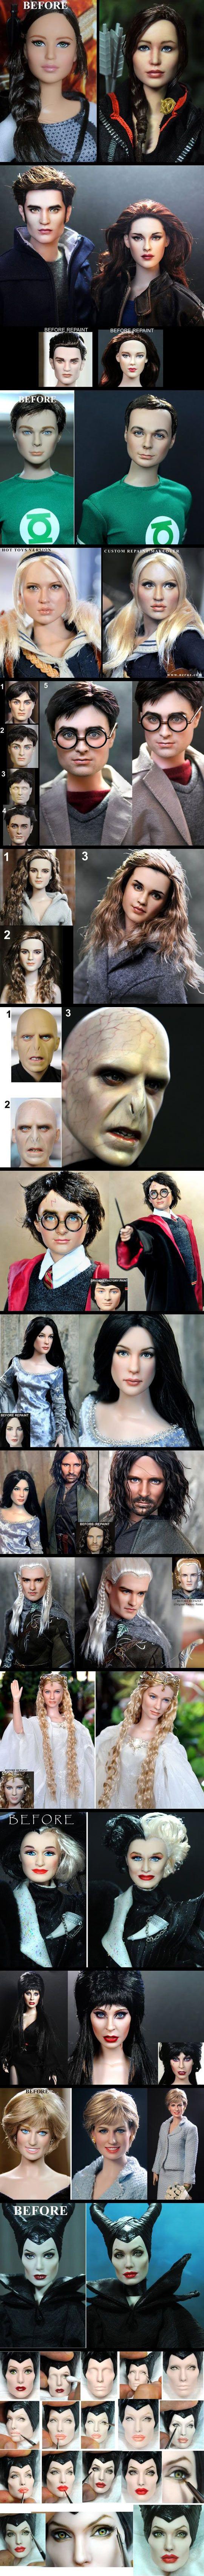 Dolls into Masterpieces. Amazing.